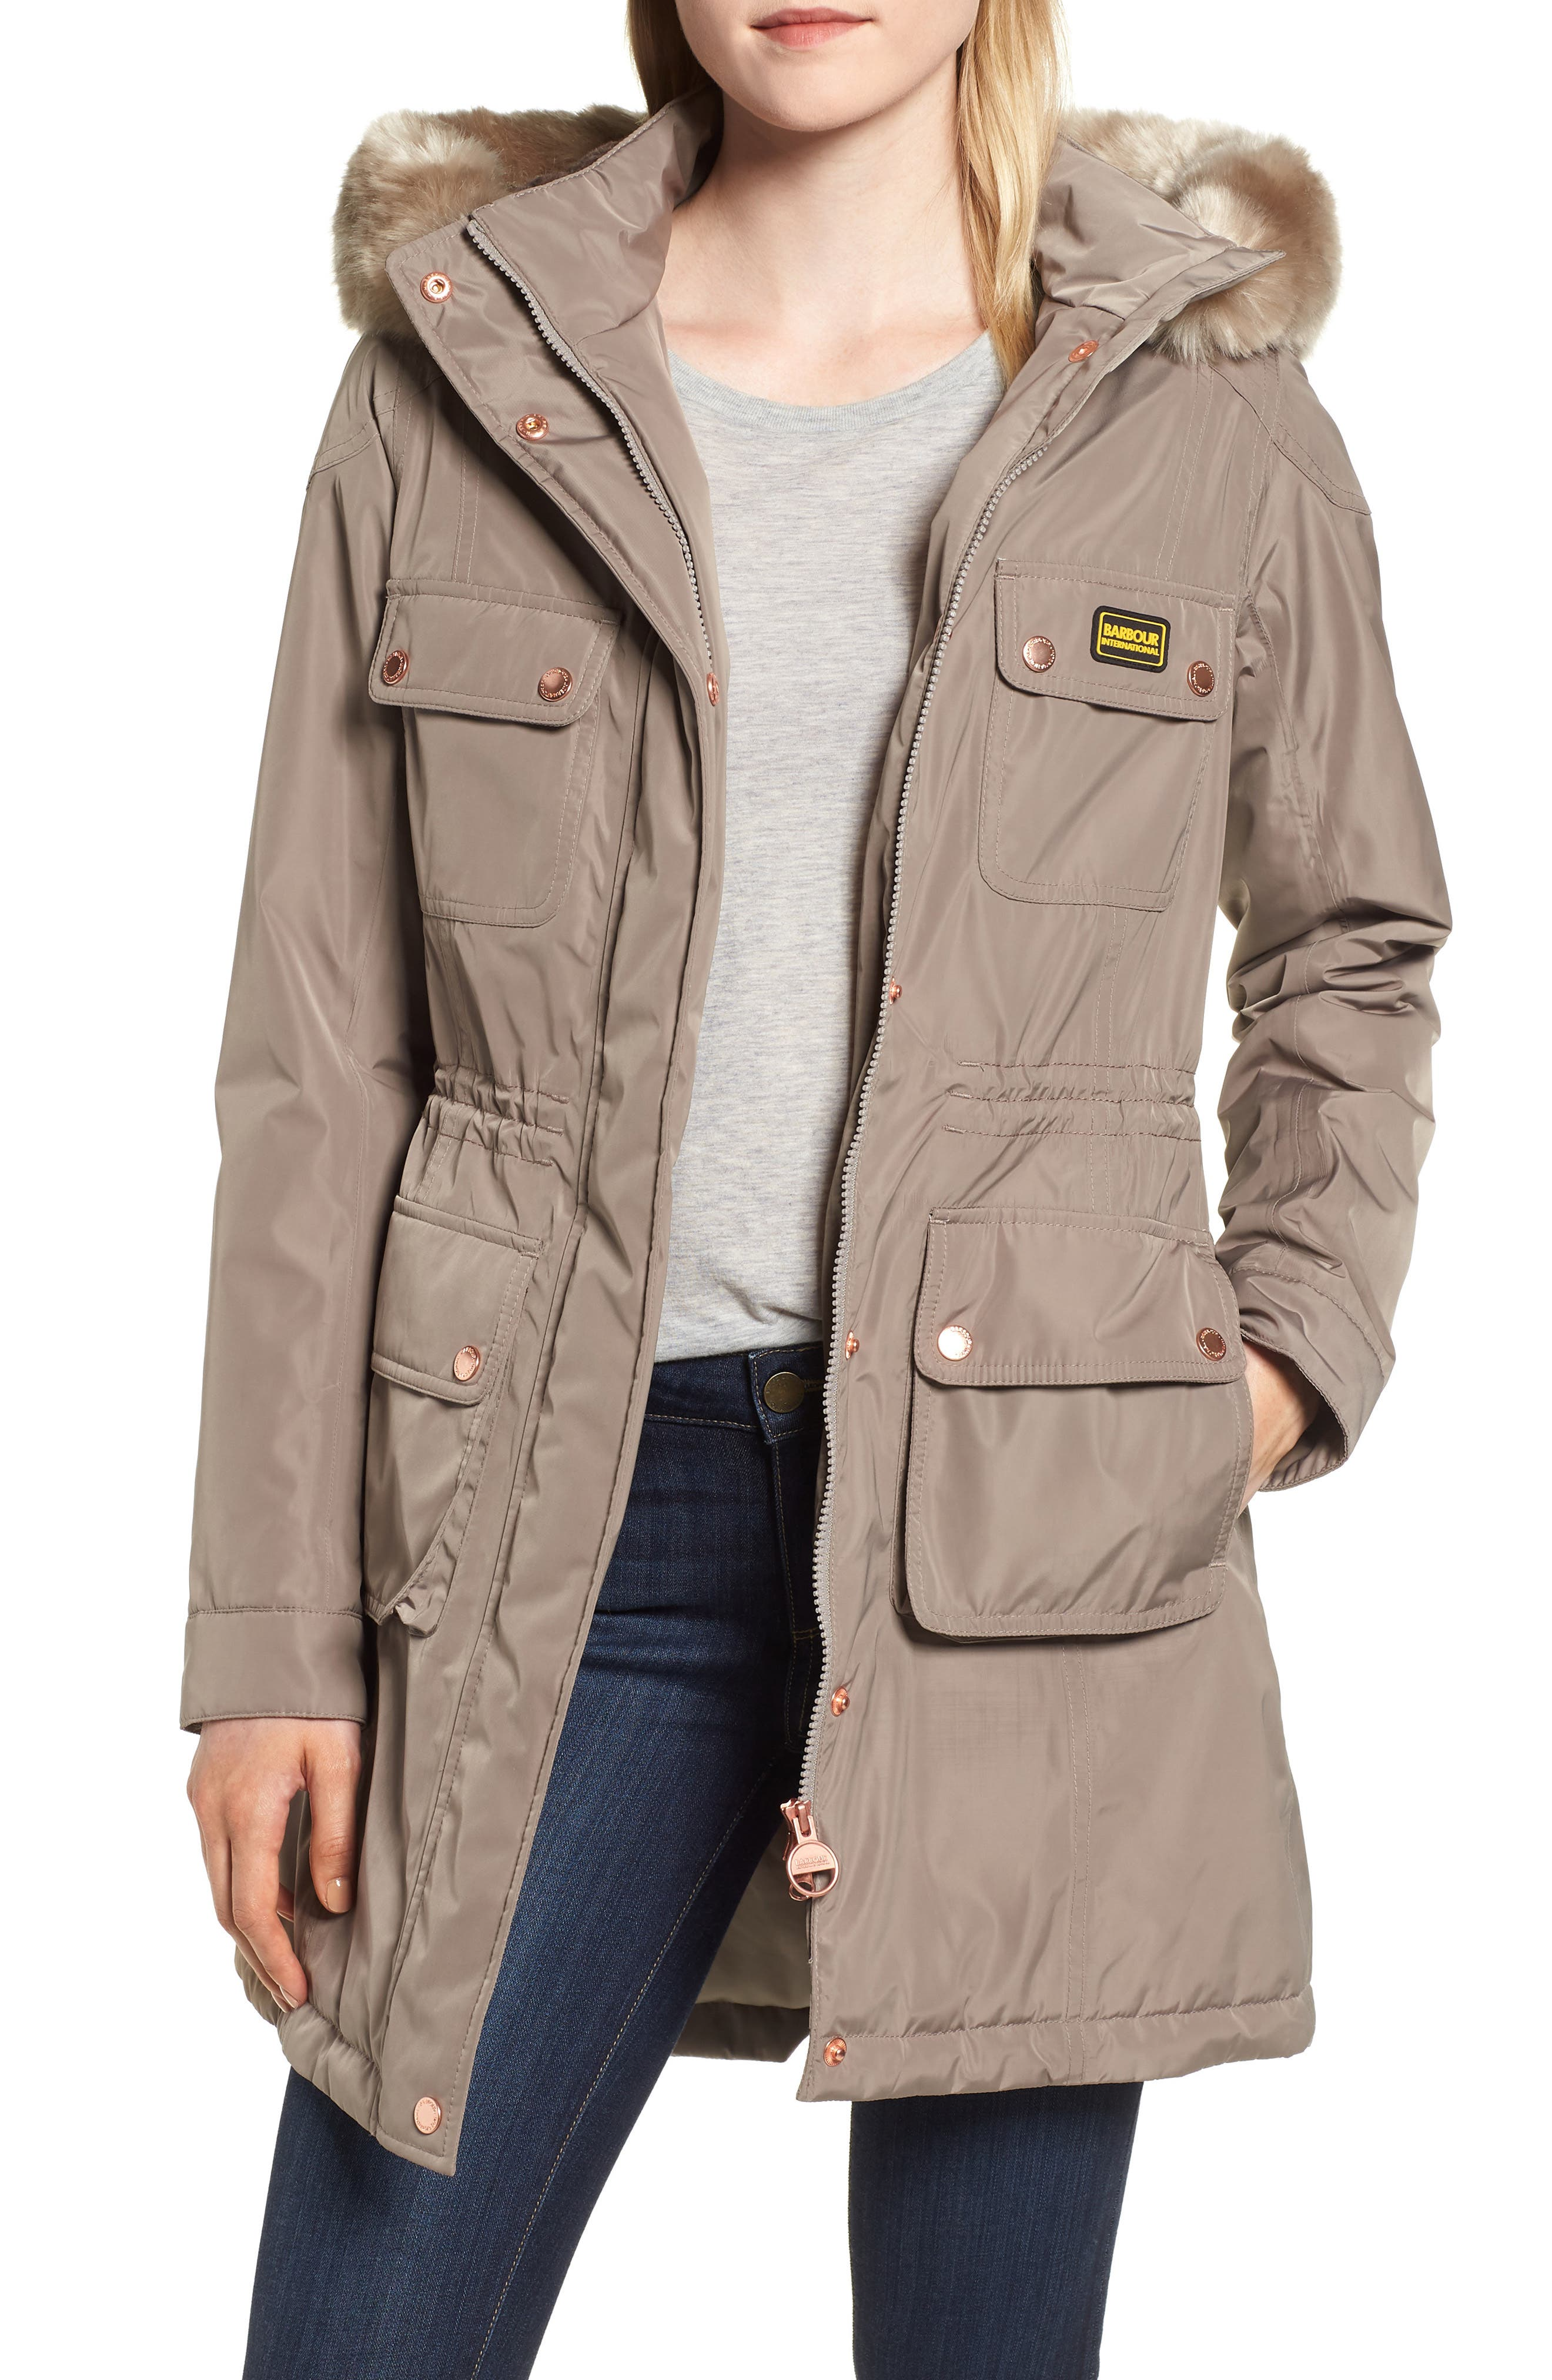 Barbour Imatra Waterproof Jacket With Faux Fur Trim, US / 14 UK - Beige